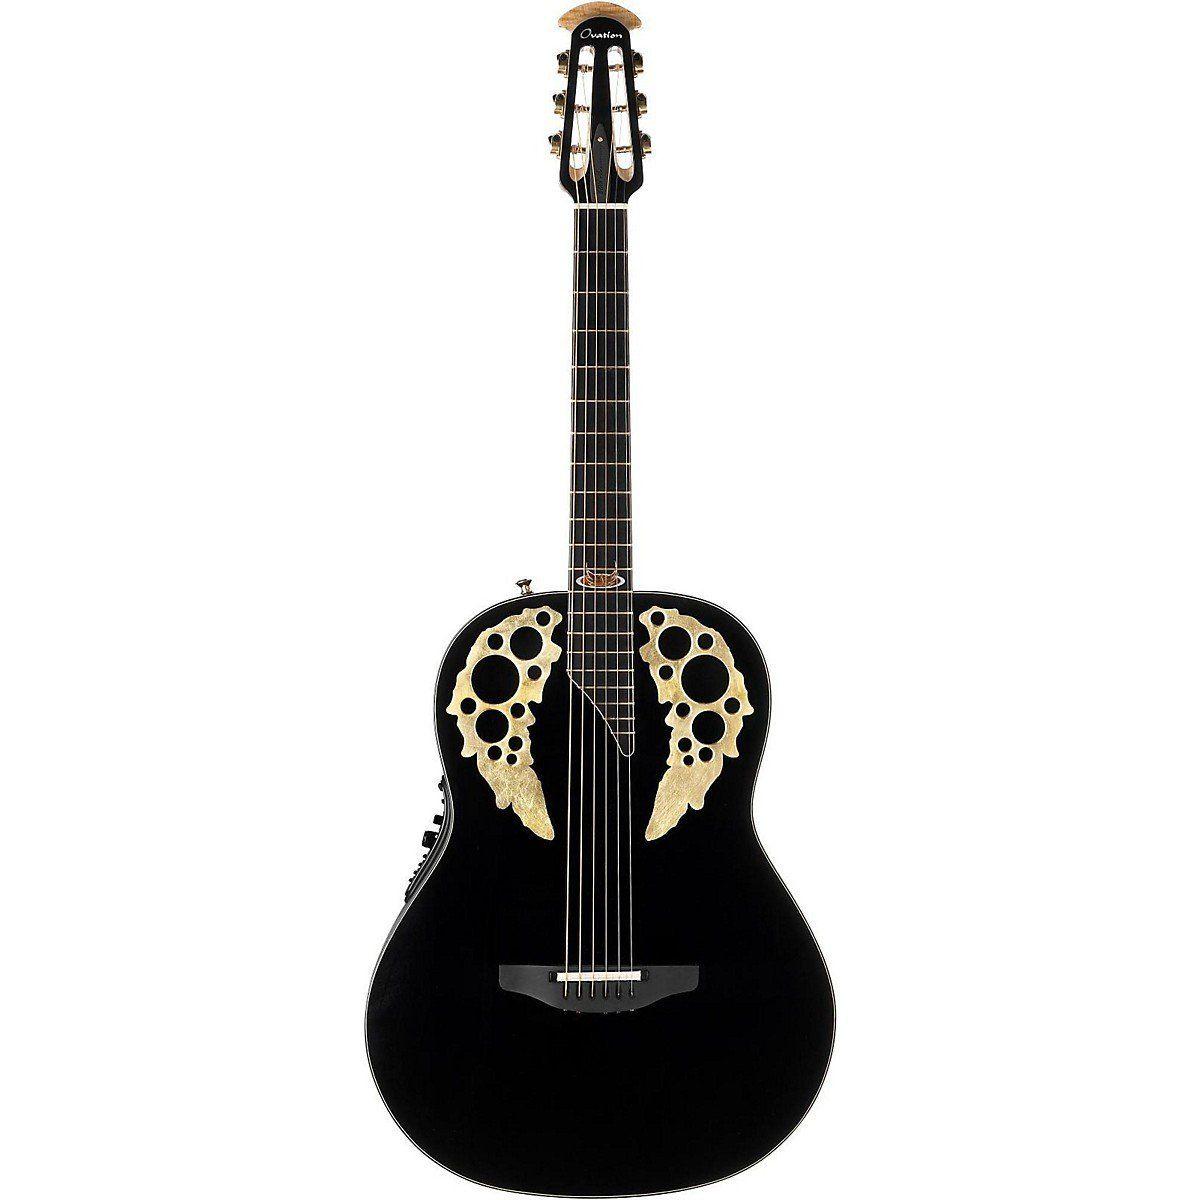 crafter kglxe 9000 koa guitare folk